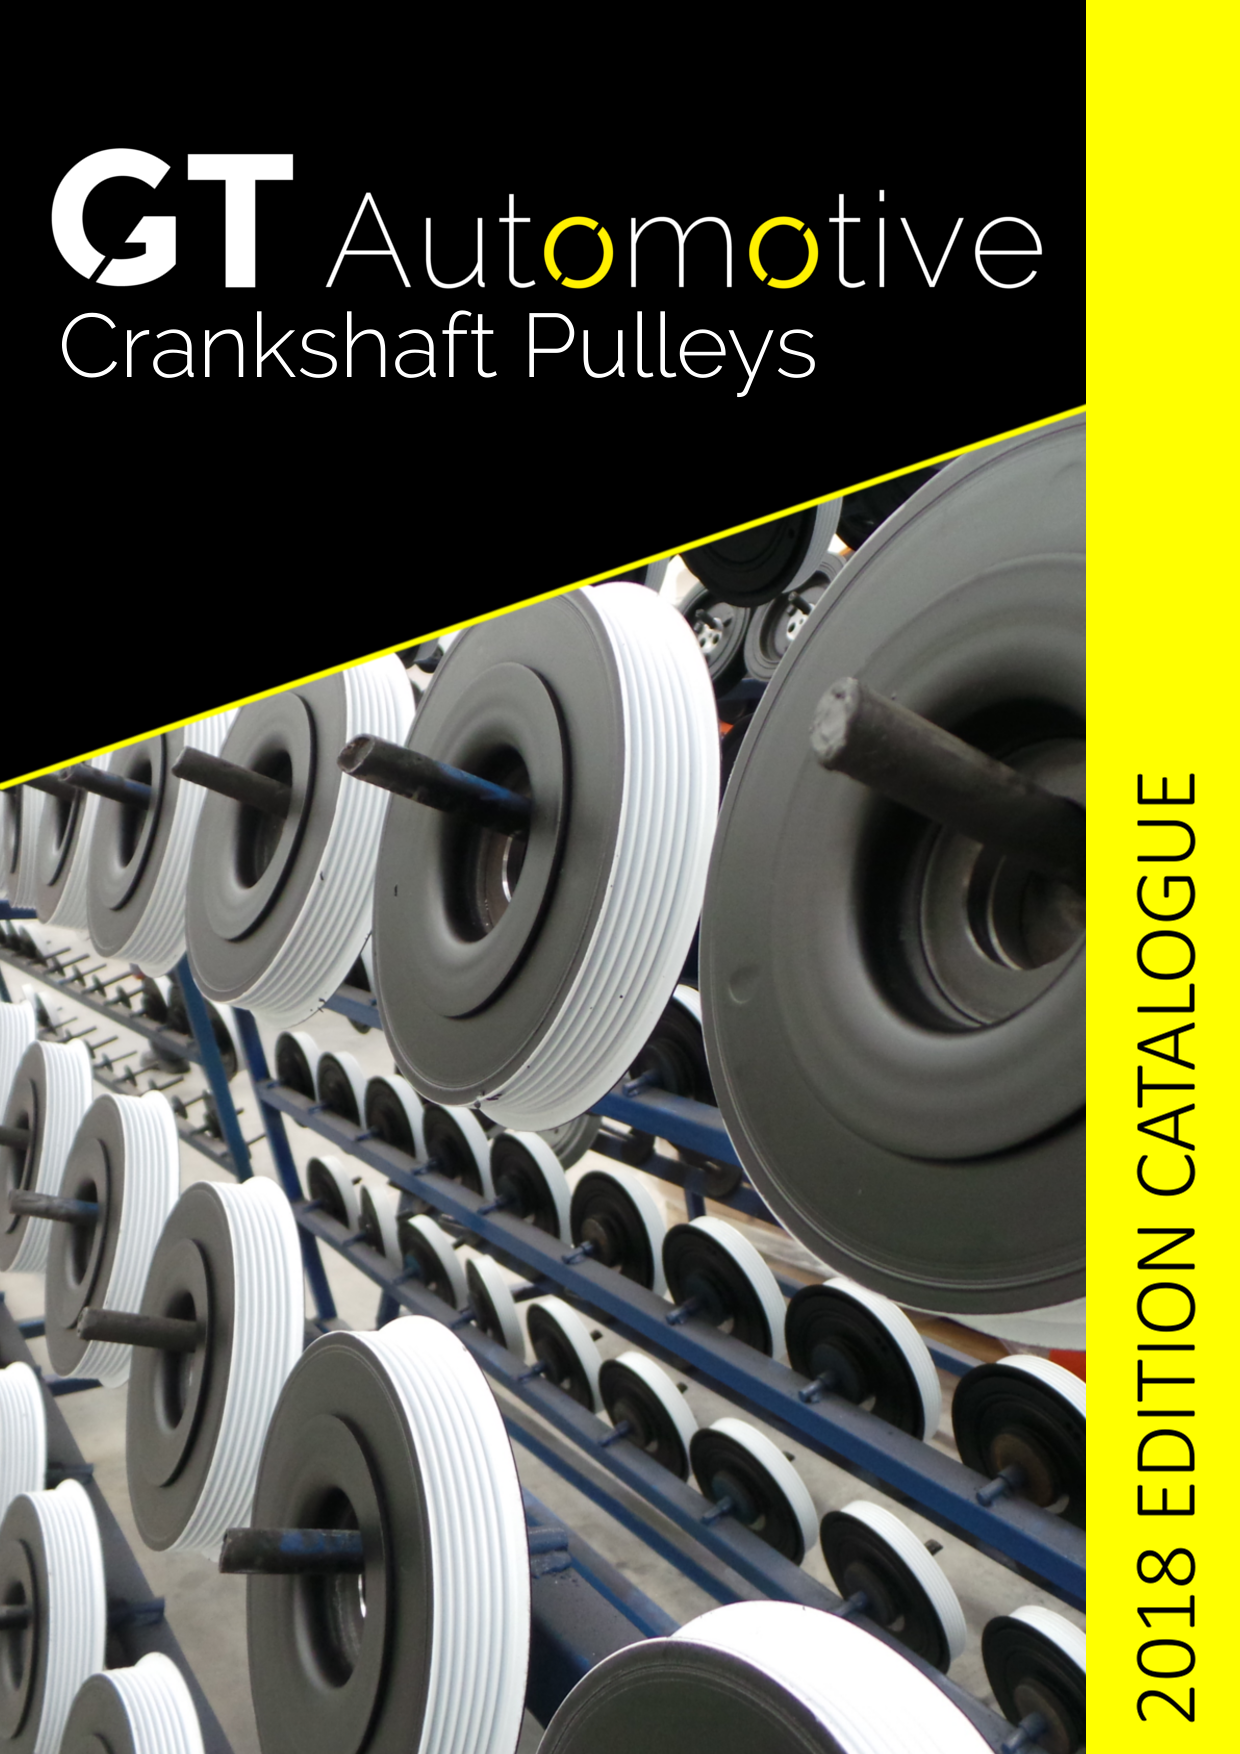 Crankshaft Pulley TVD Catalogue Cover